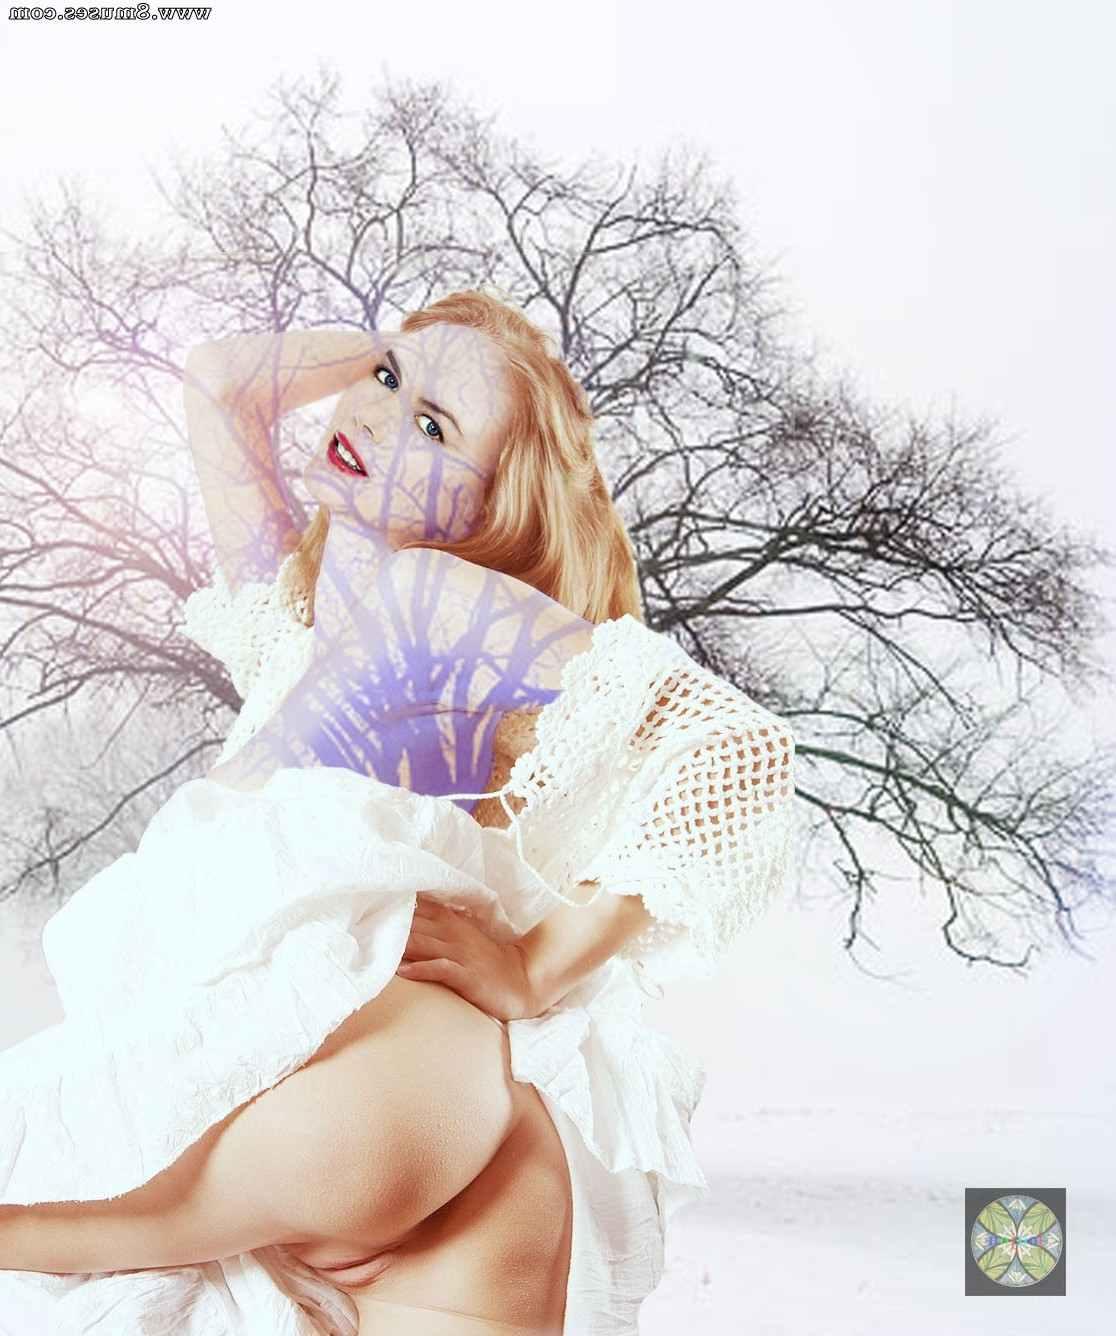 Fake-Celebrities-Sex-Pictures/Nicole-Kidman Nicole_Kidman__8muses_-_Sex_and_Porn_Comics_893.jpg